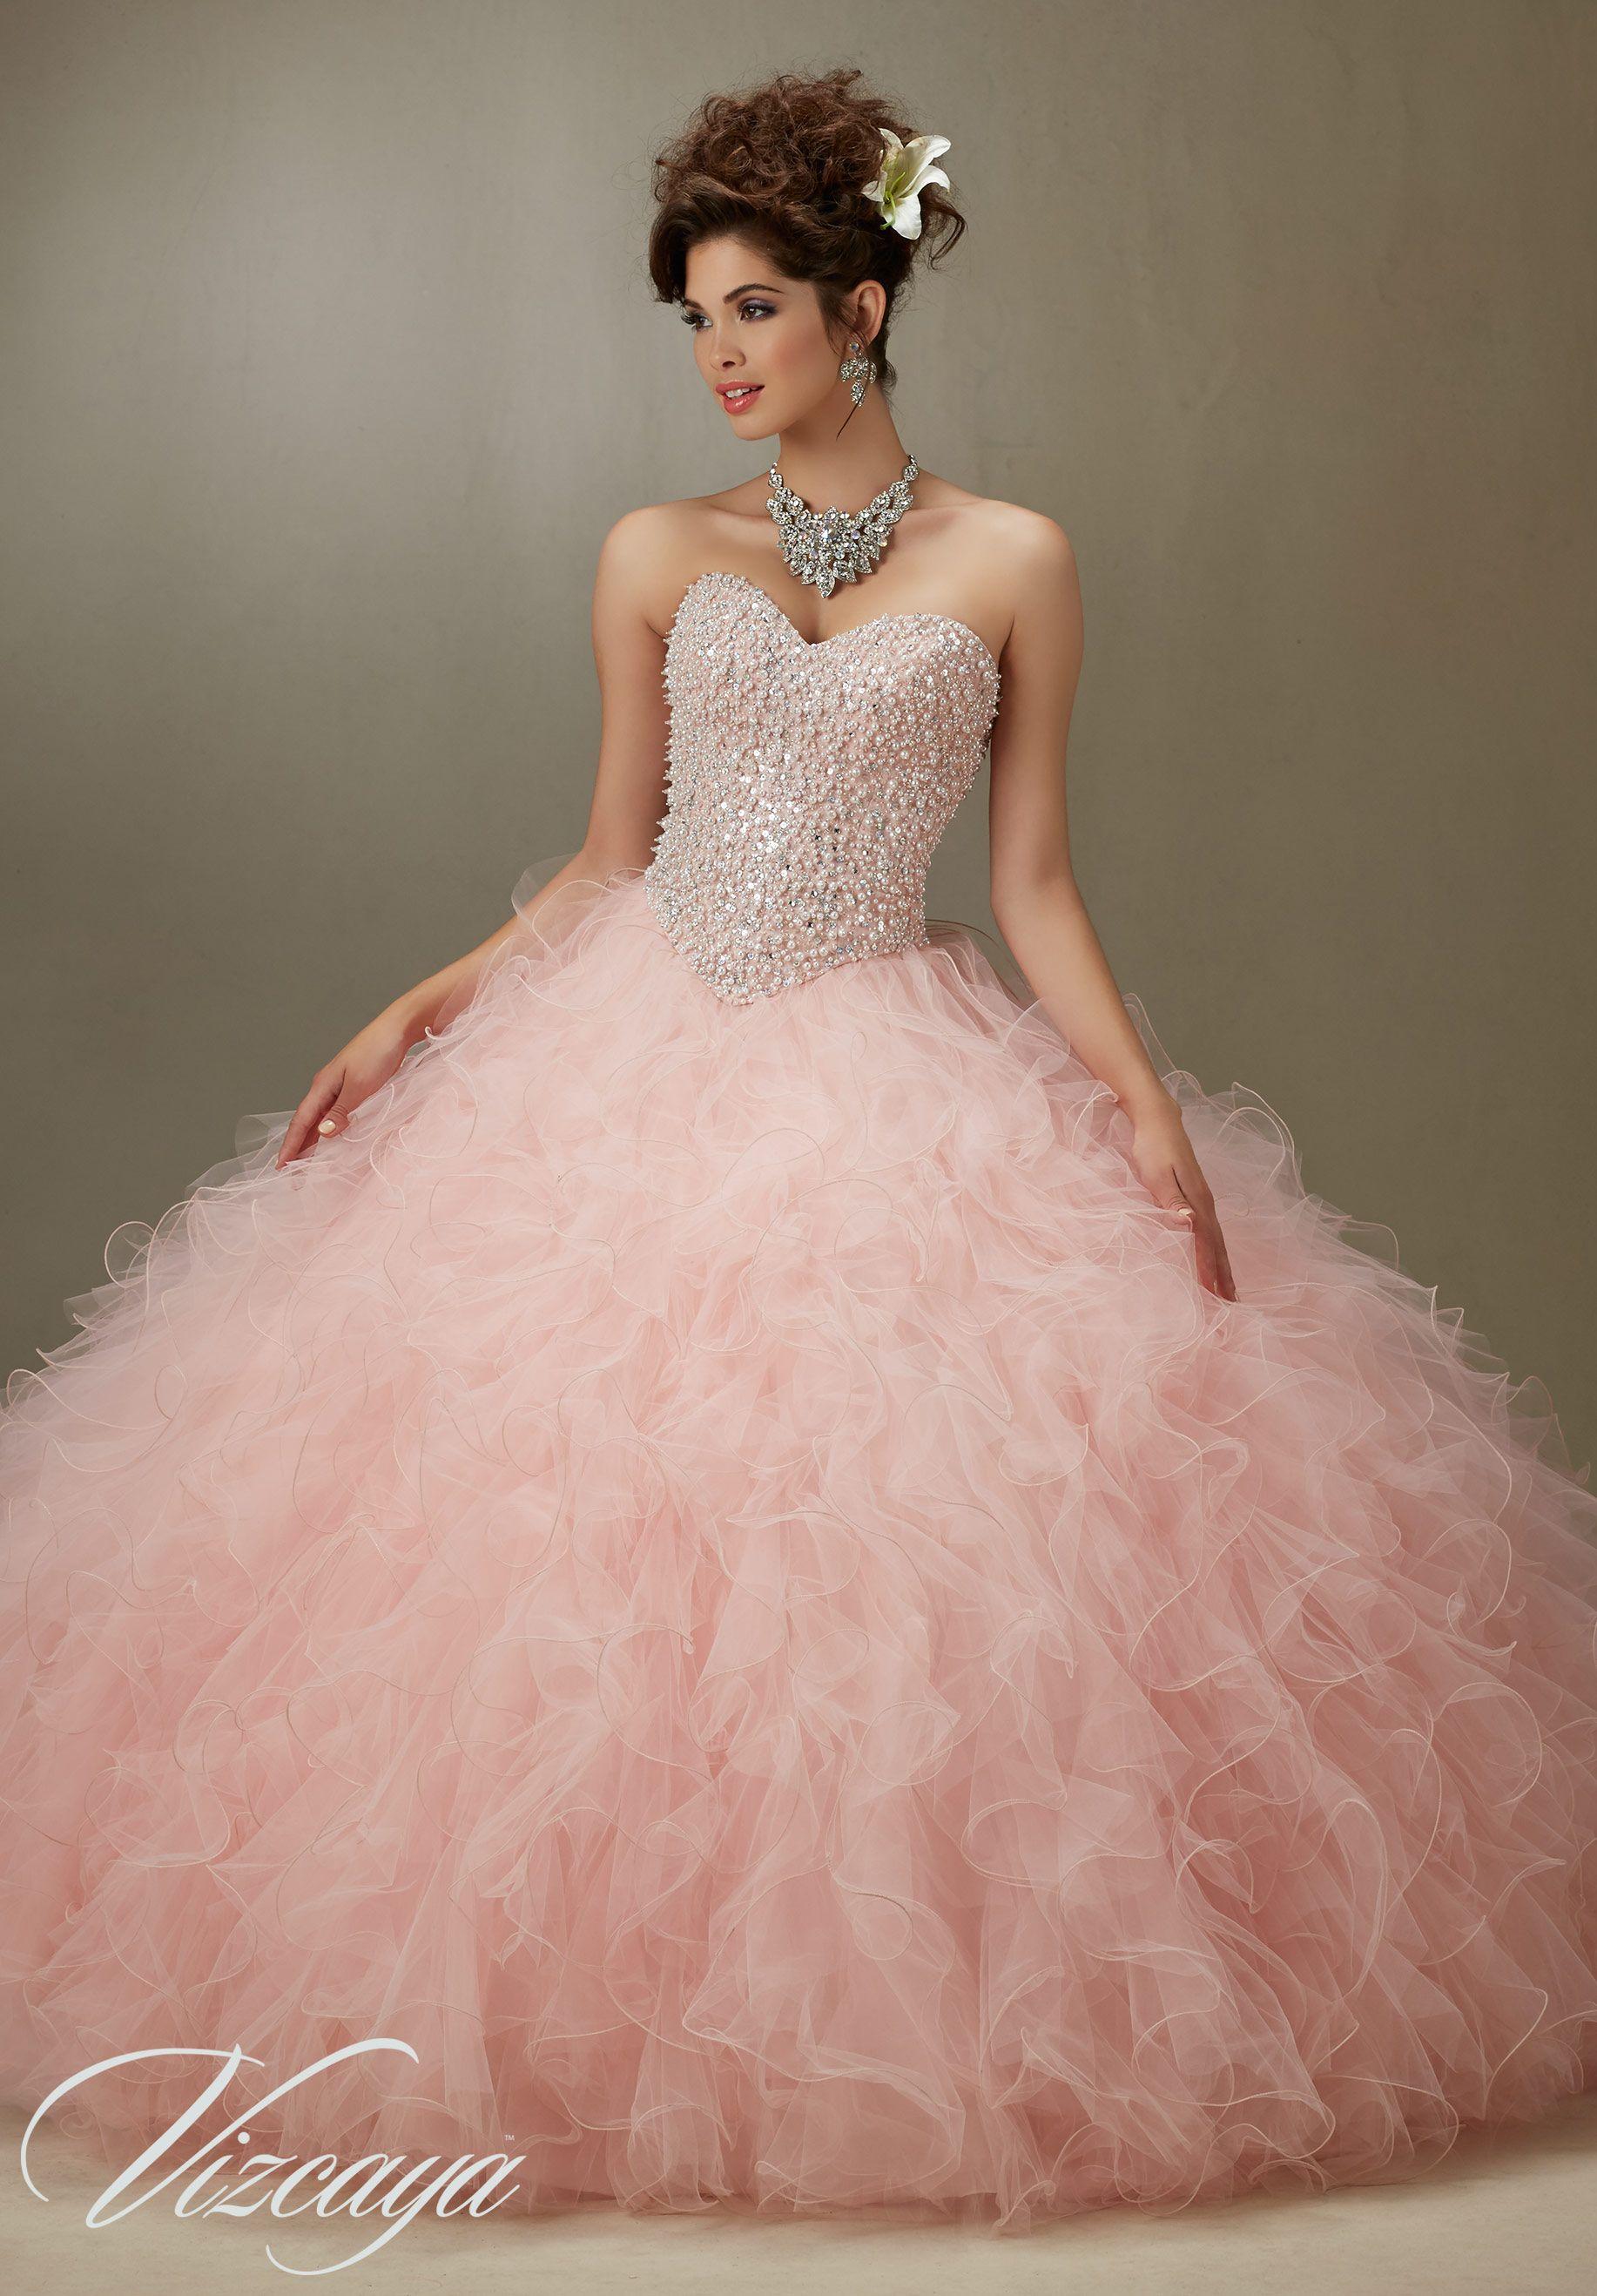 Beautiful quinceanera dress #misXV #misquinces #quinceanera #XV ...